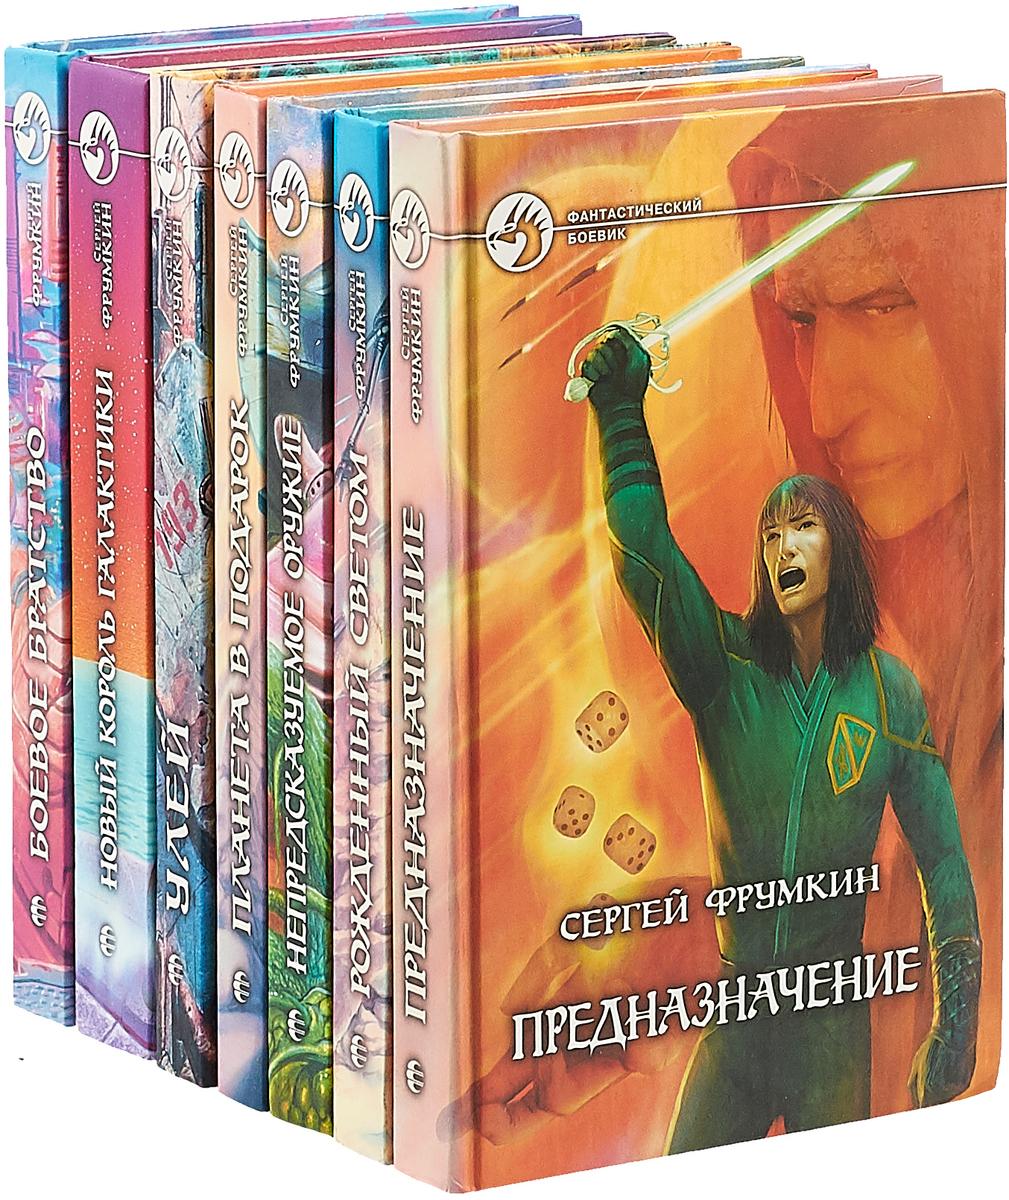 Сергей Фрумкин Сергей Фрумкин (комплект из 7 книг )